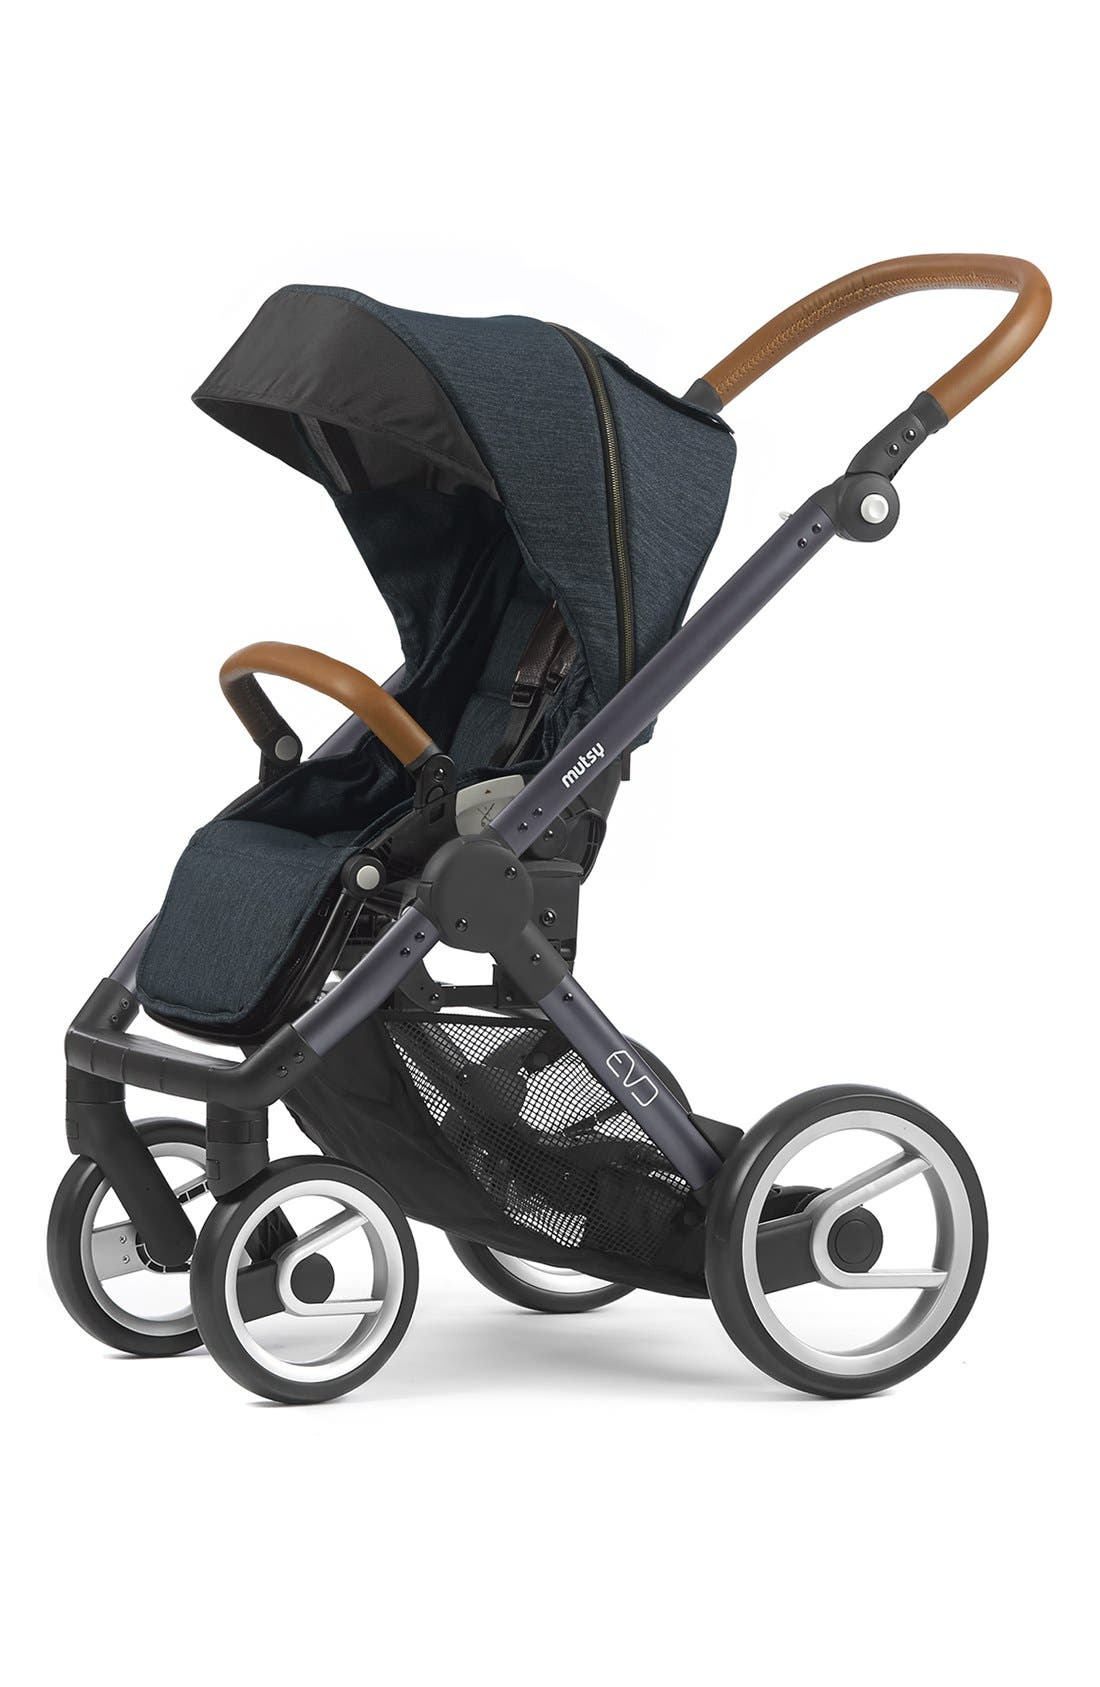 Mutsy Evo - Industrial Stroller